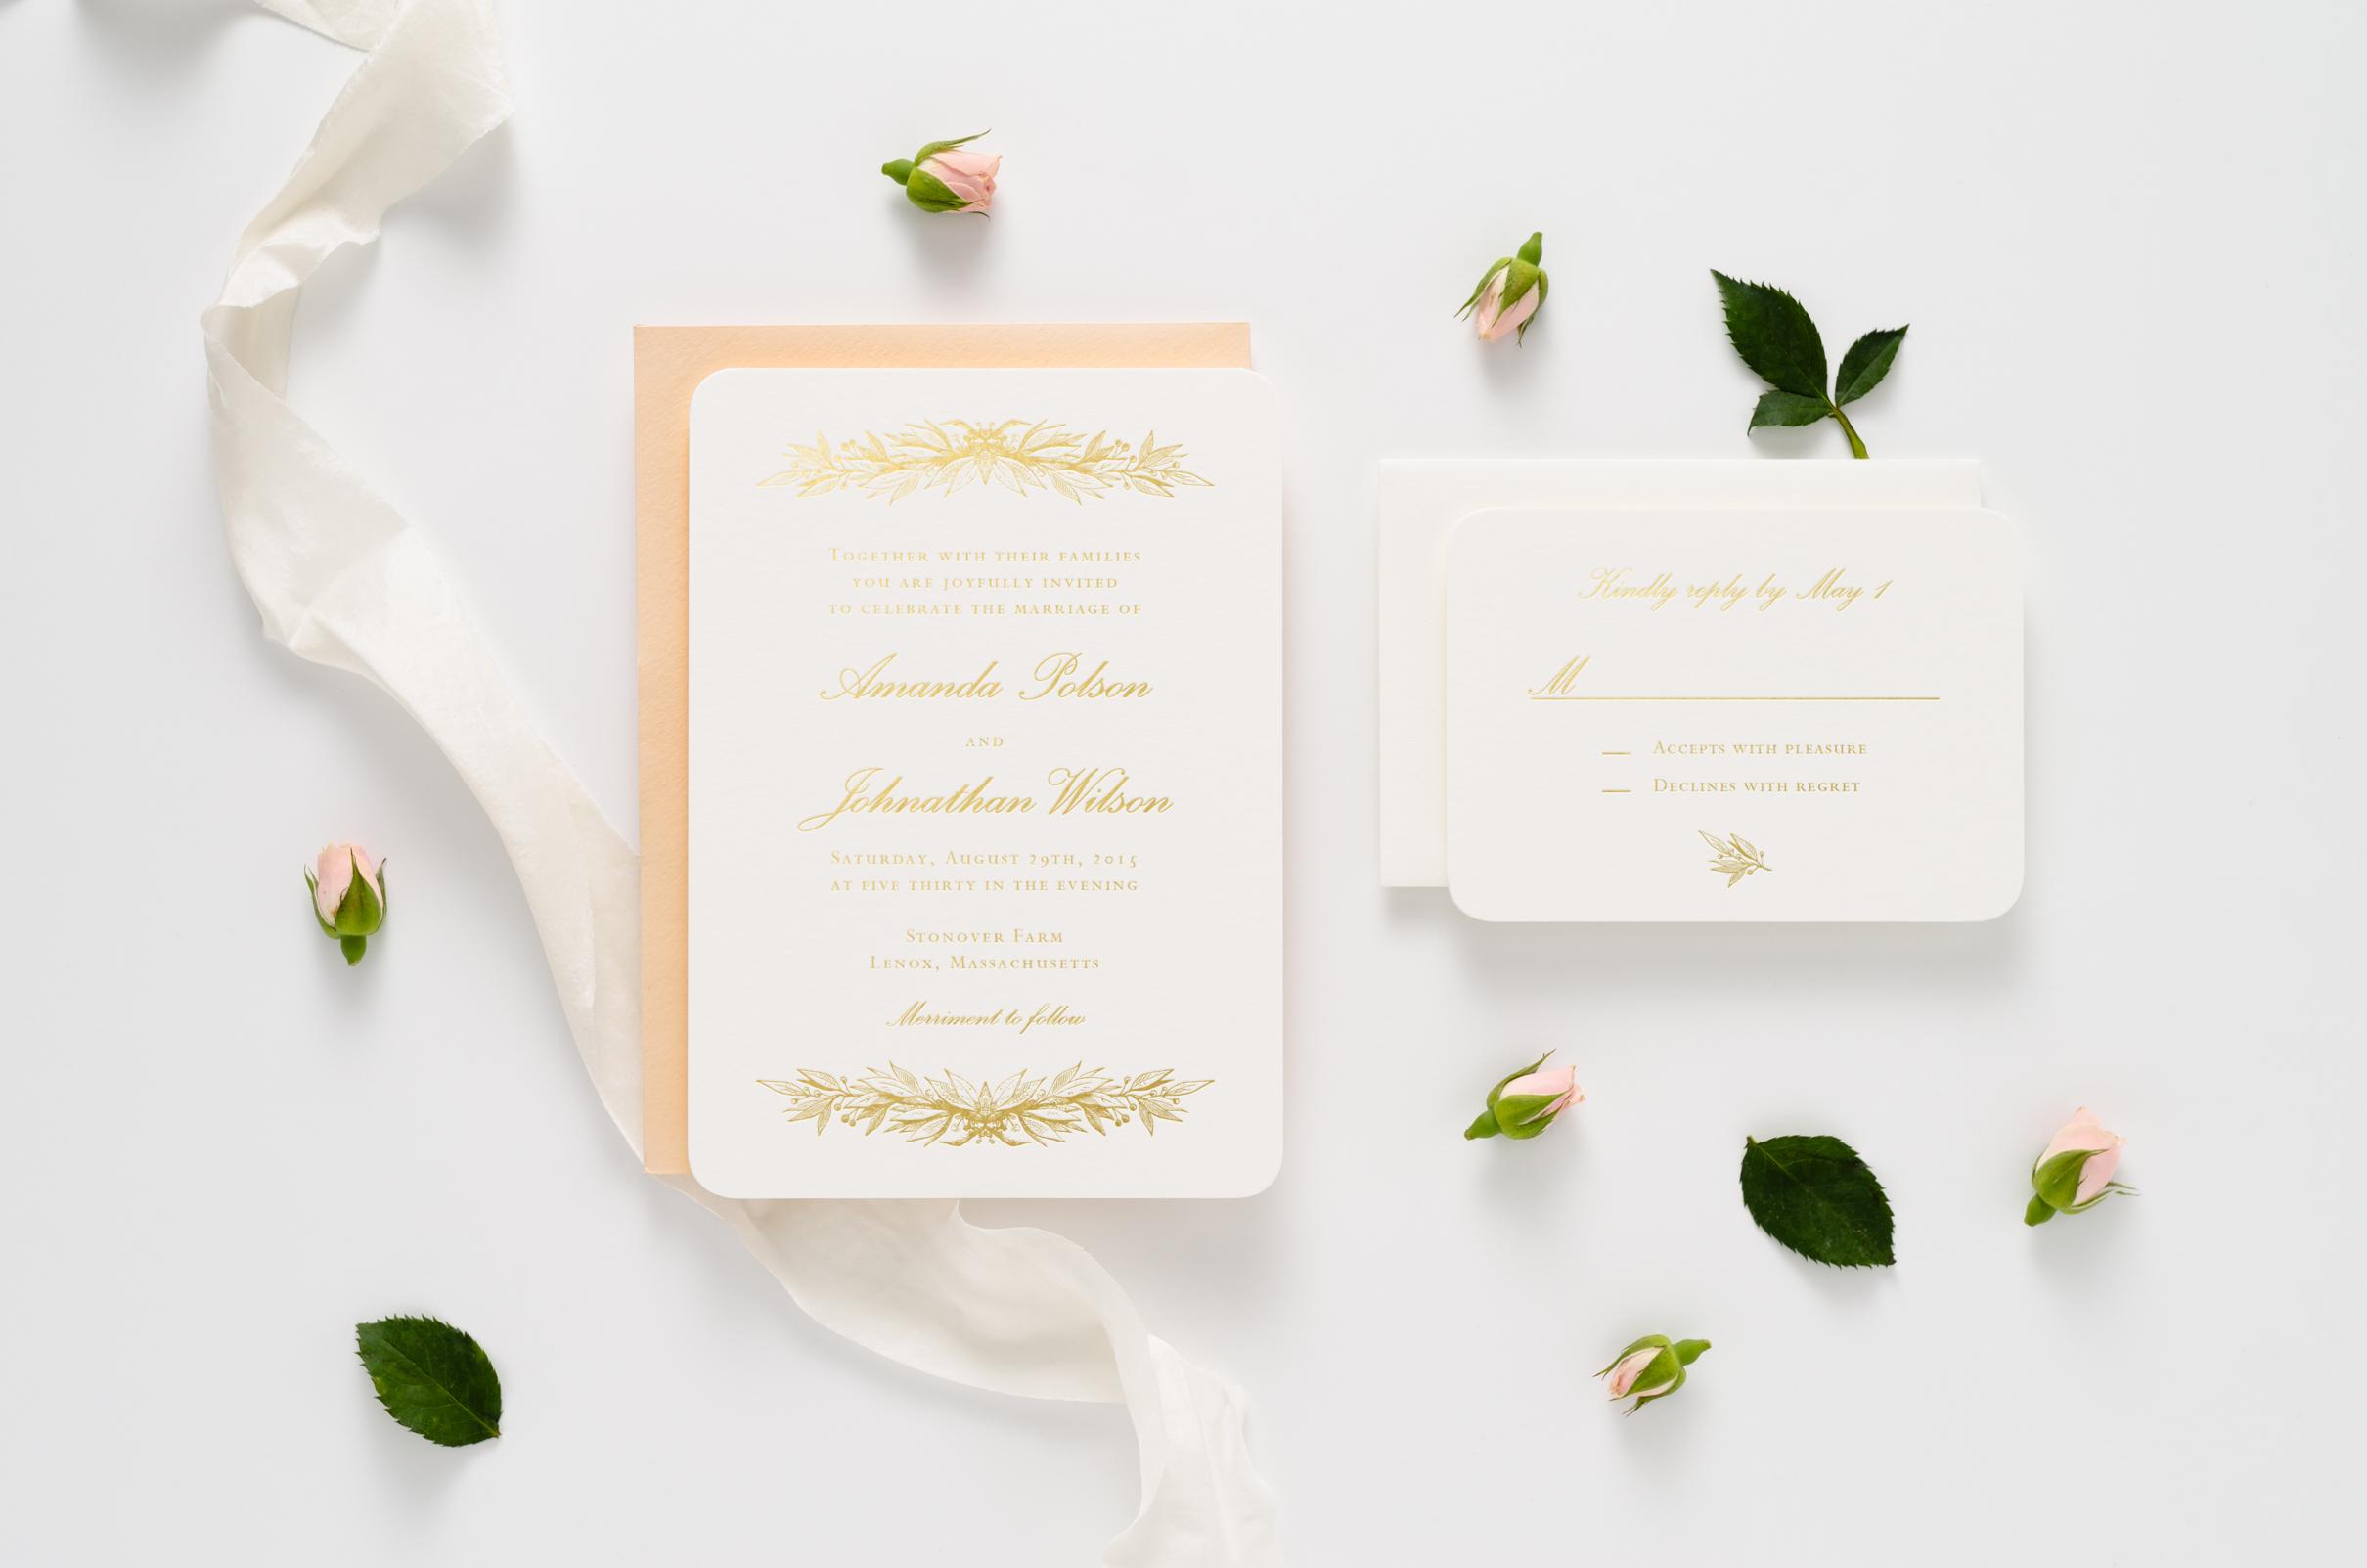 Elegant gold foil wedding invitation suite with decorative botanical accents